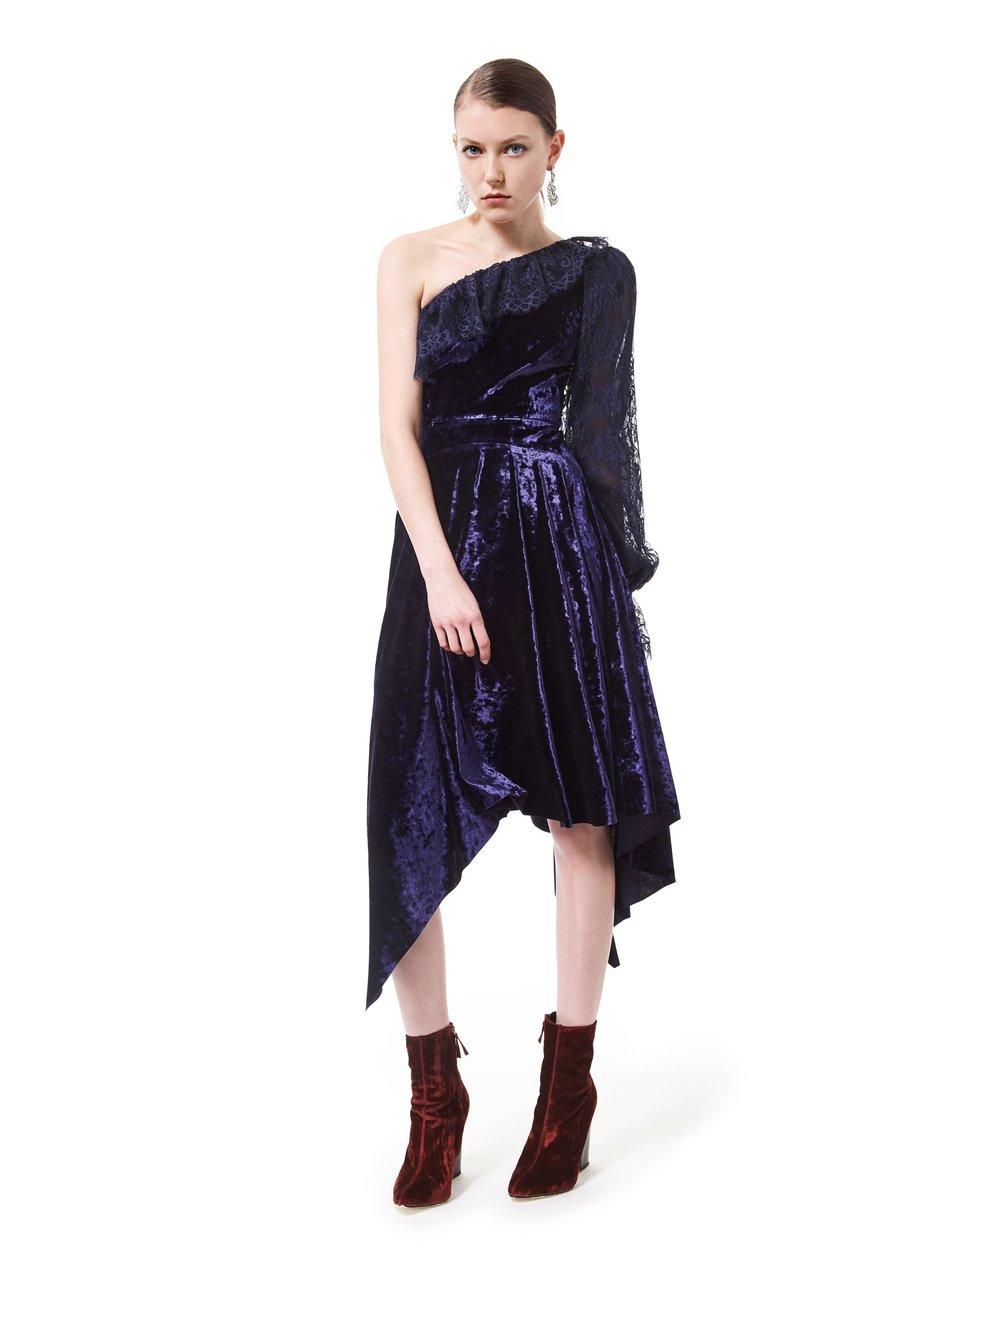 Lively Dress £350